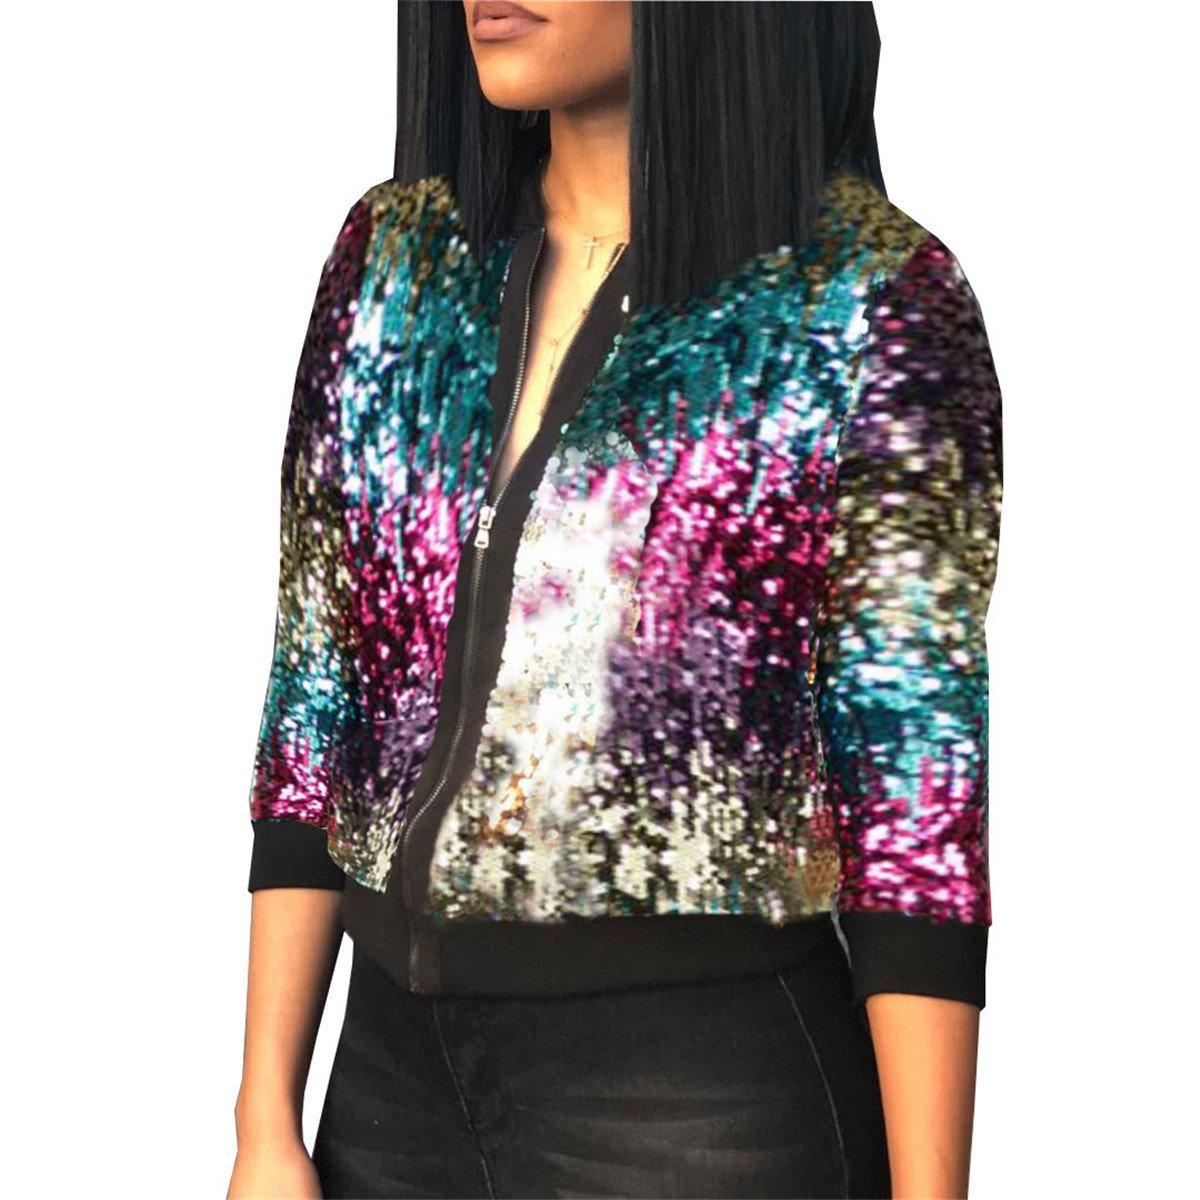 Women's Spring Autumn Fashion Zip Up Sequins Biker Bomber Jacket Baseball Jacket Casual Short Coat Outwear XL